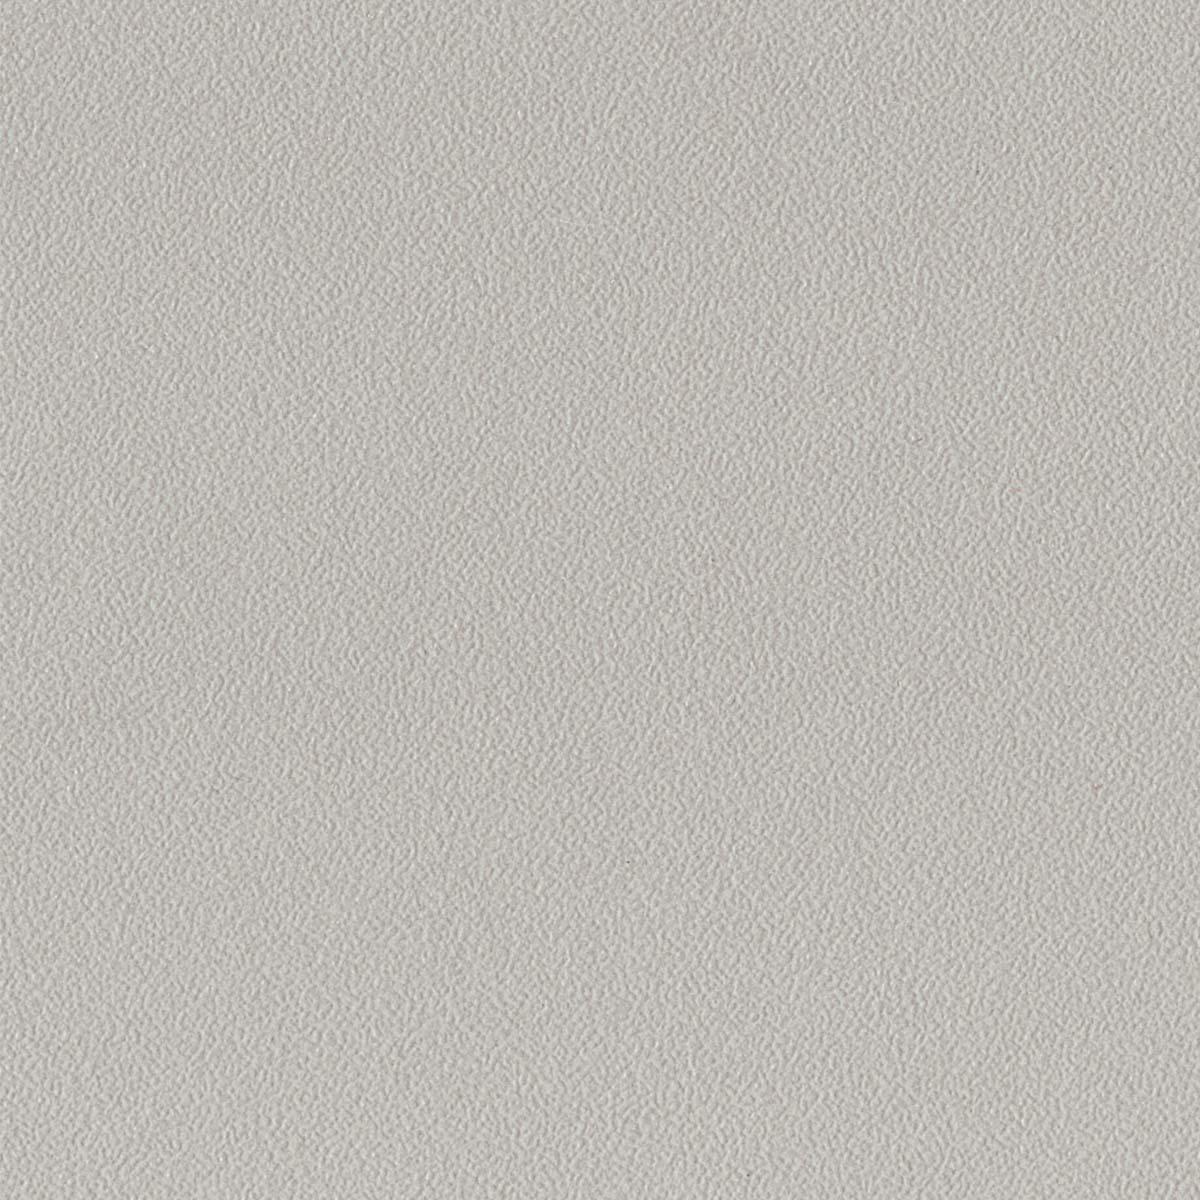 HF1922 VL Stone Grey